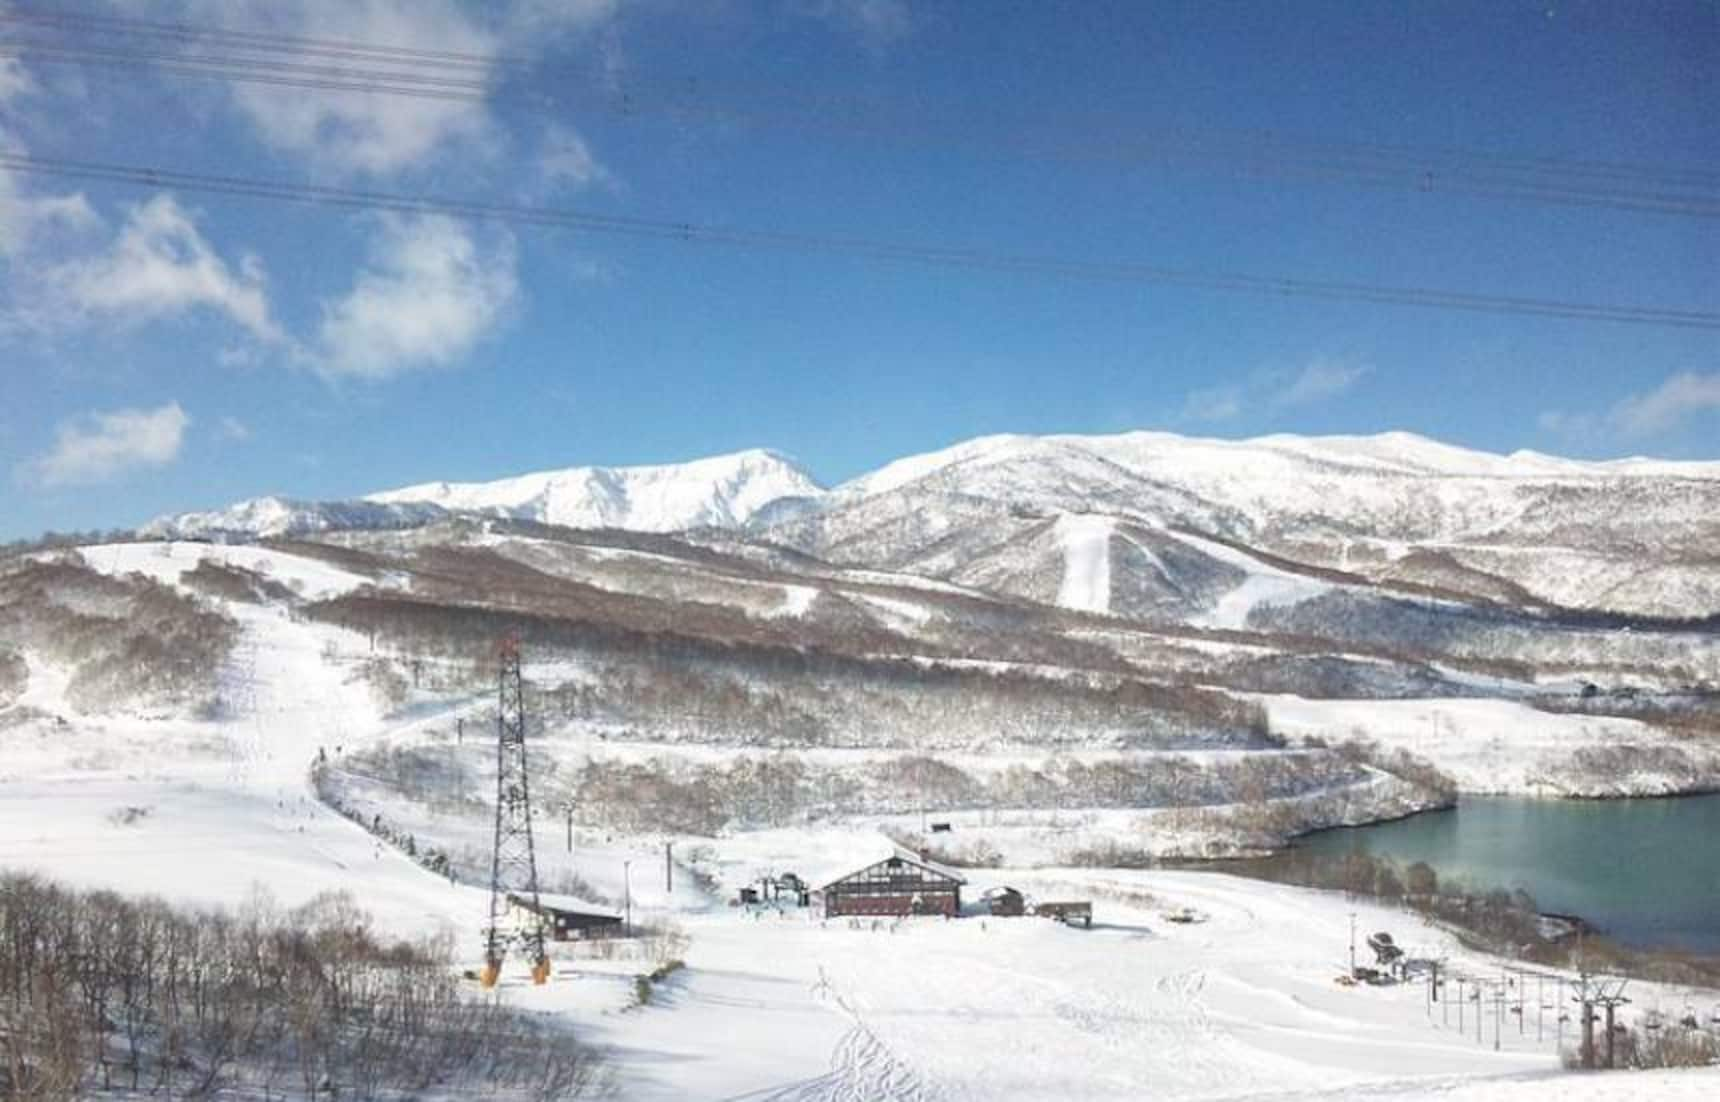 10 Best Ski Resorts In Japan For Beginners